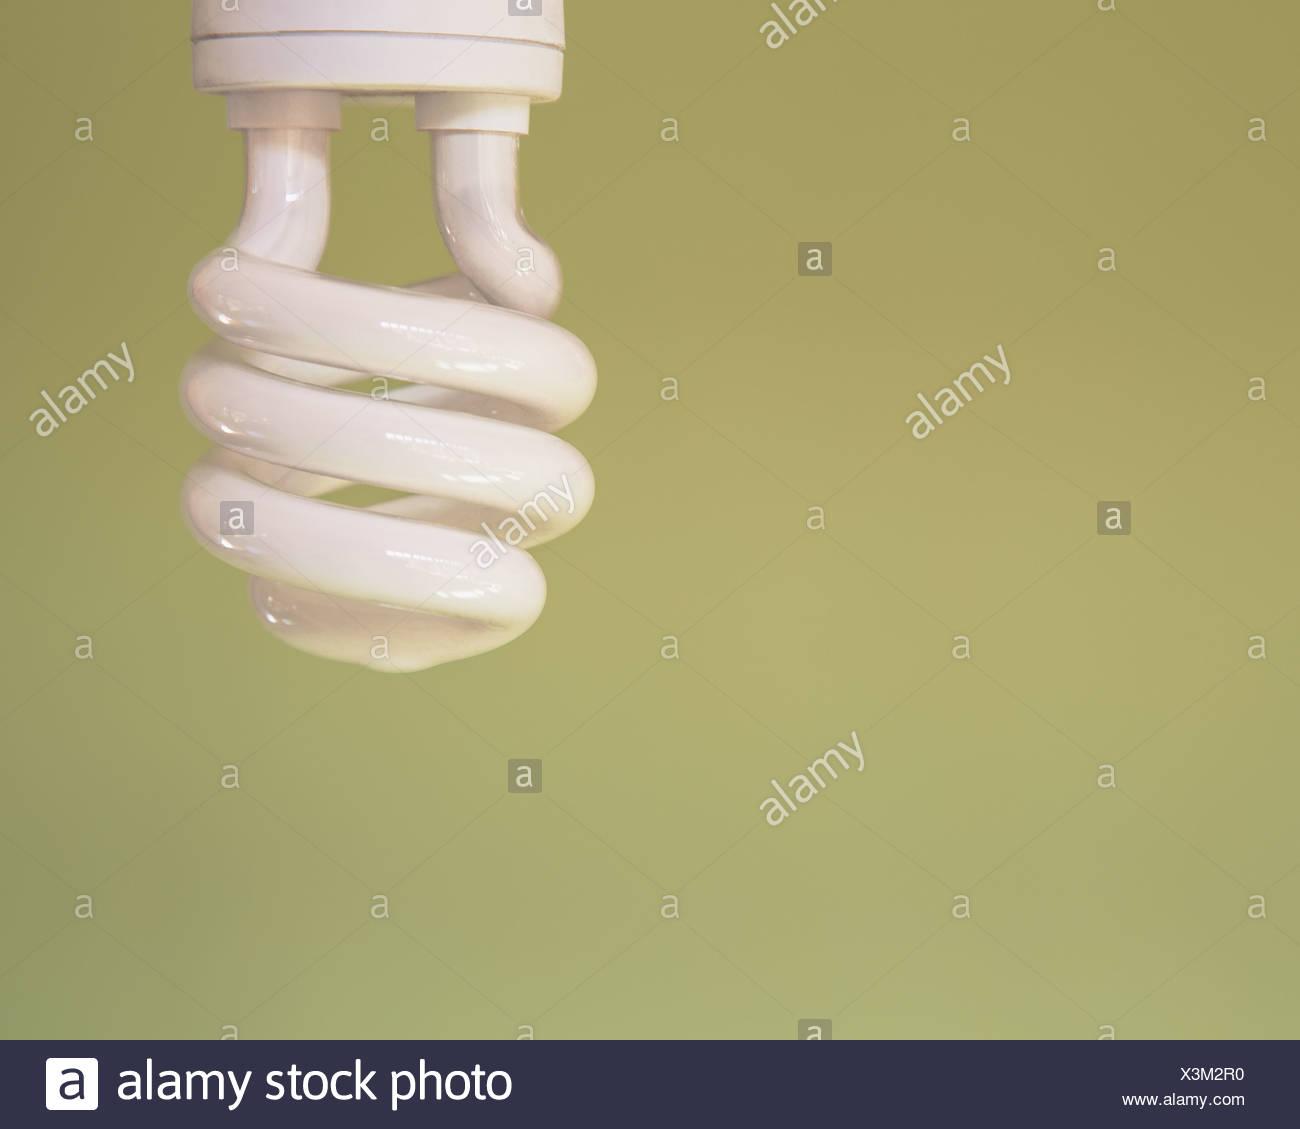 energy efficient fluorescent light bulb CFL - Stock Image